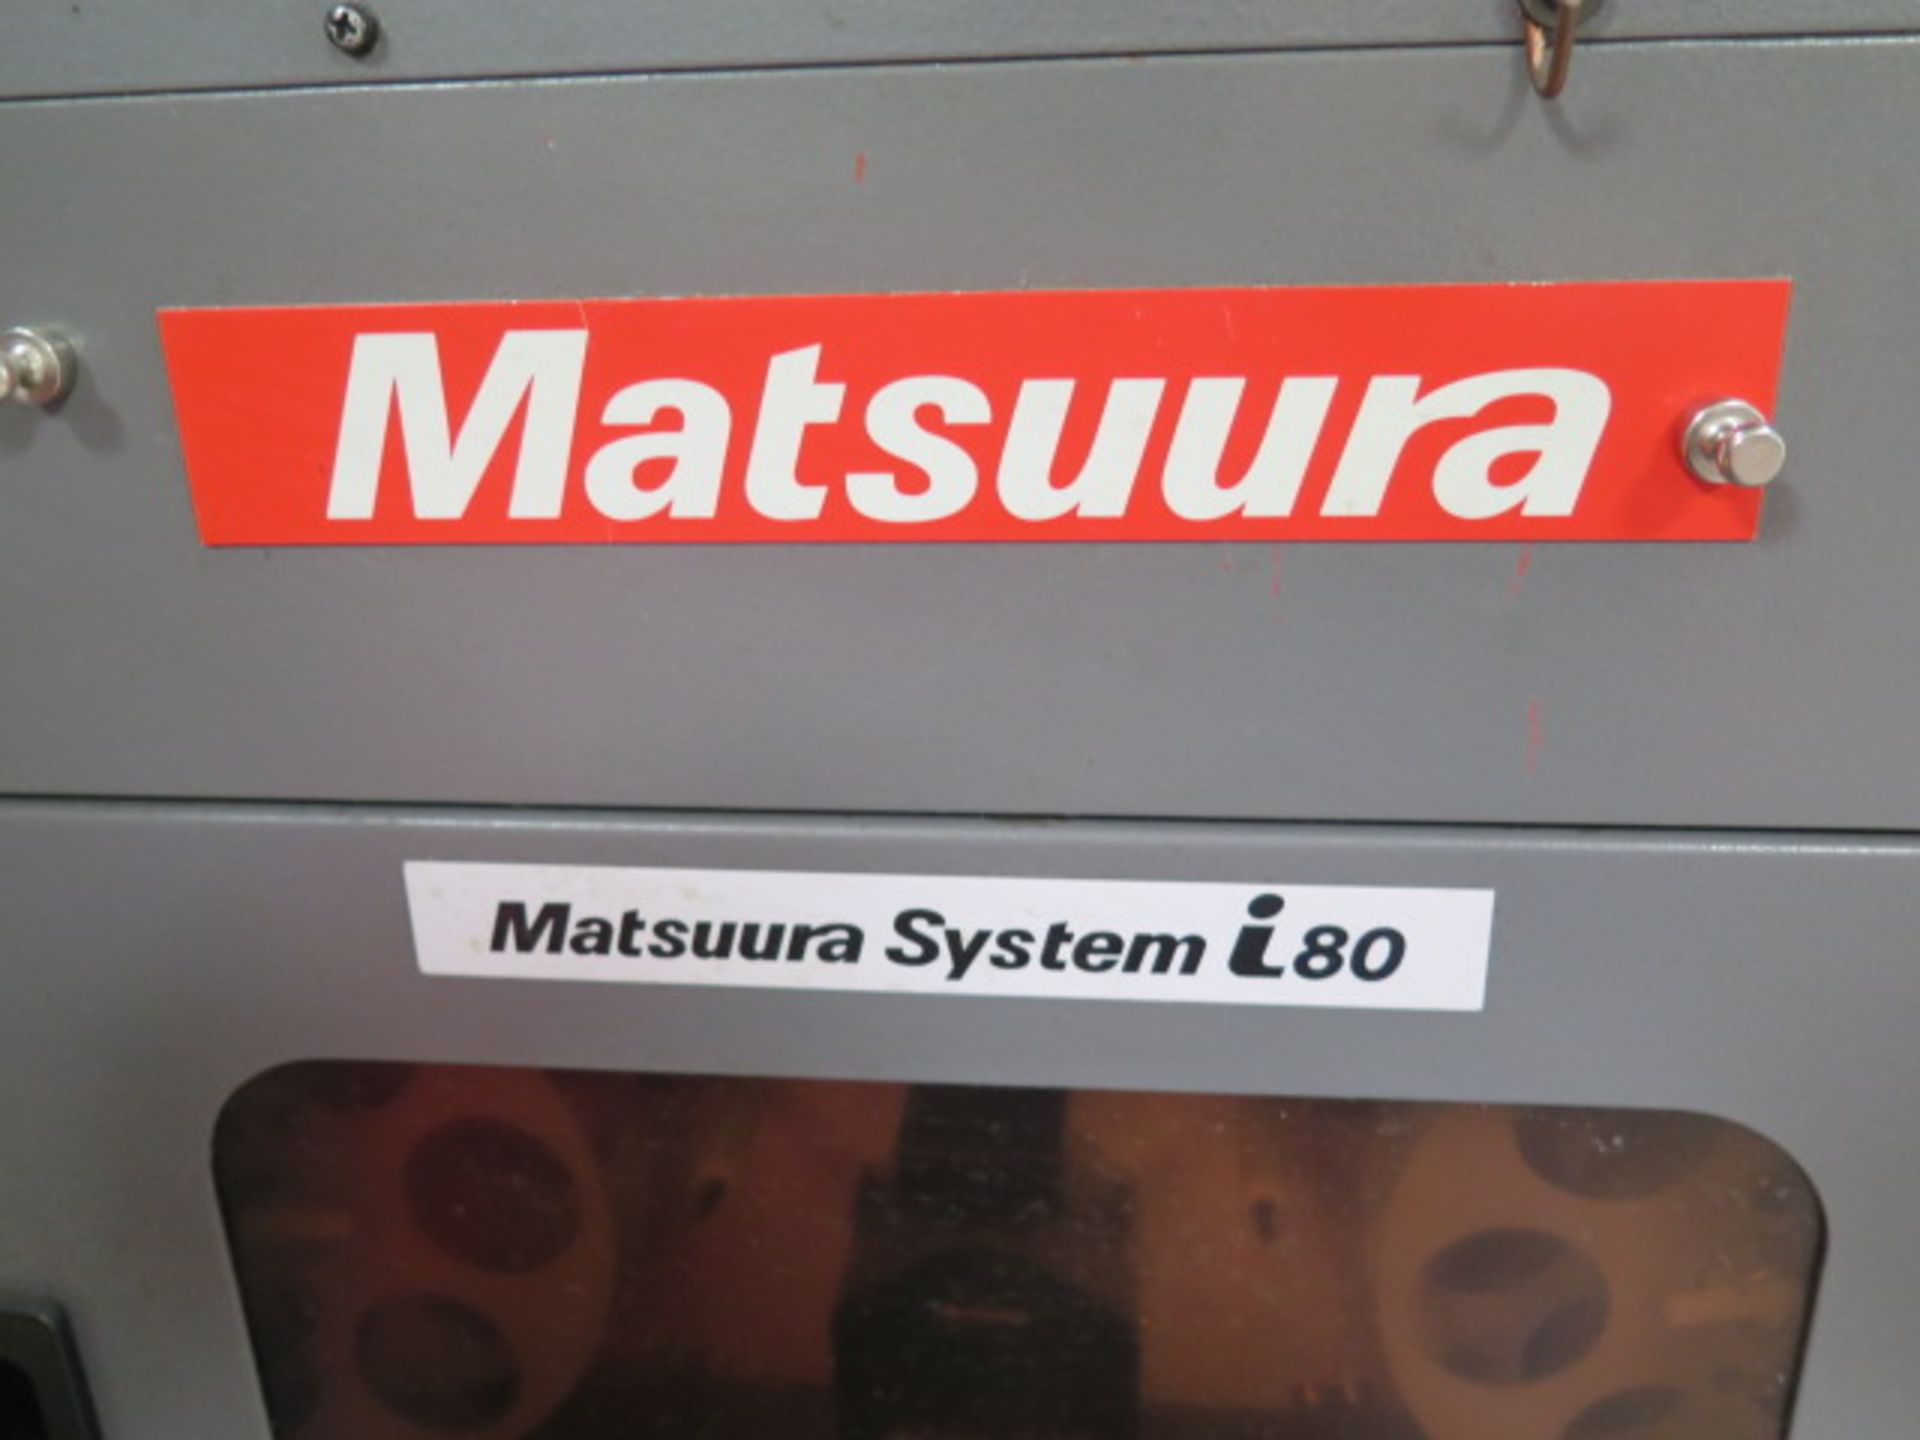 1992 Matsuura MC-450H-30-PC II 10-Pallet CNC Horizontal Machining Center s/n 910609609, SOLD AS IS - Image 6 of 23